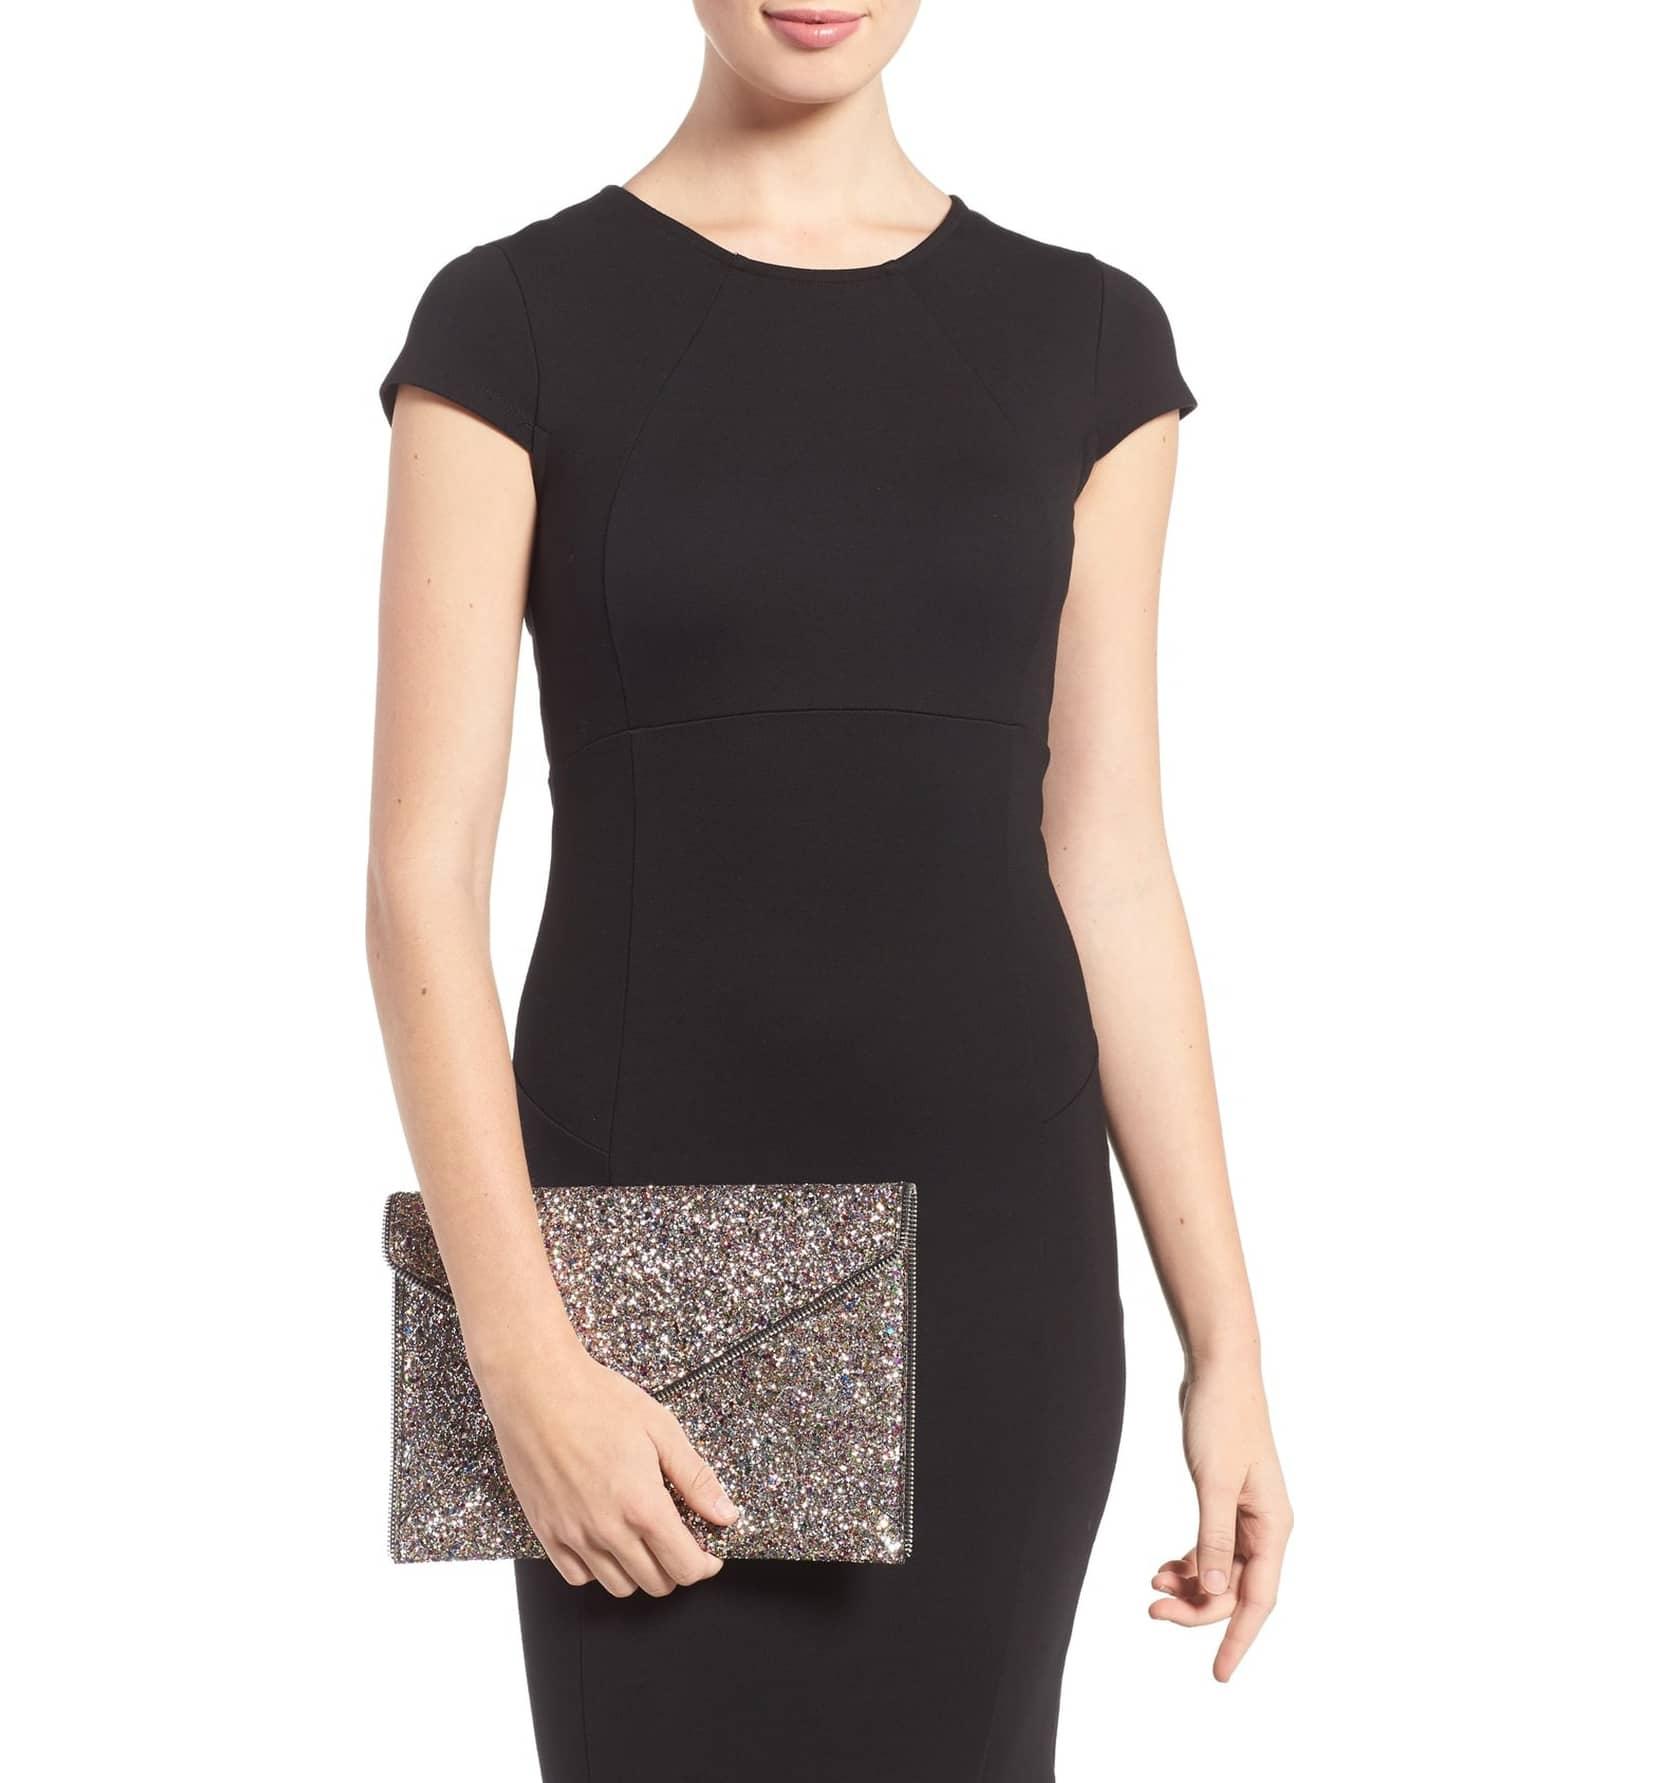 64dfbc79a Rebecca Minkoff Handbags & Purses - Rebecca Minkoff Glitter Leo Envelope  Clutch Leather Handbag - Walmart.com